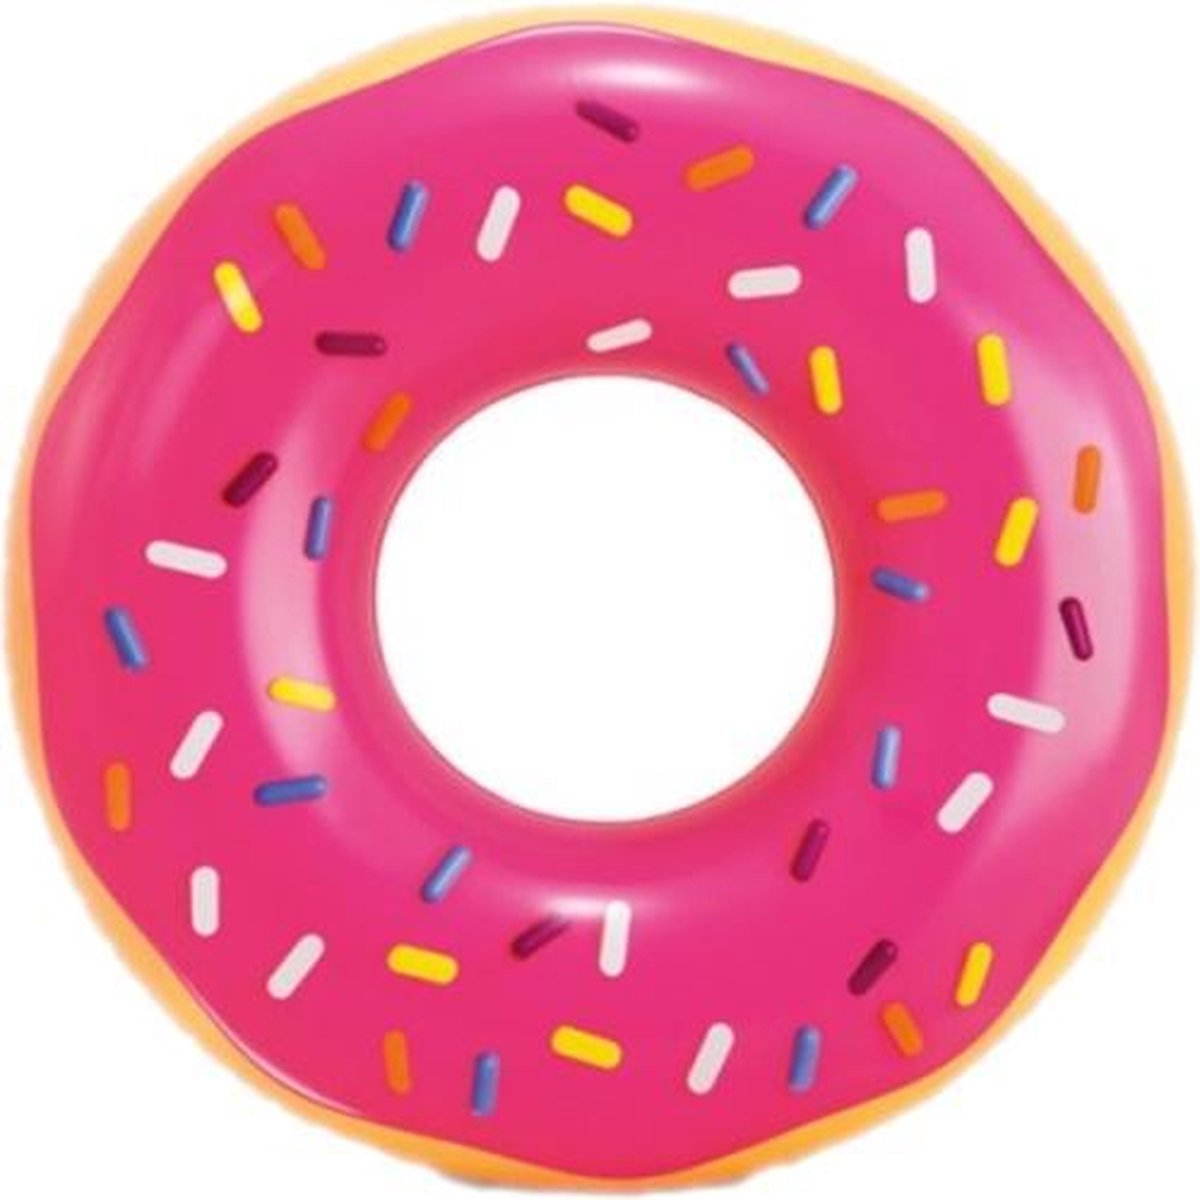 Intex Zwemband Frosted Donut 114 Cm Pvc Roze/bruin